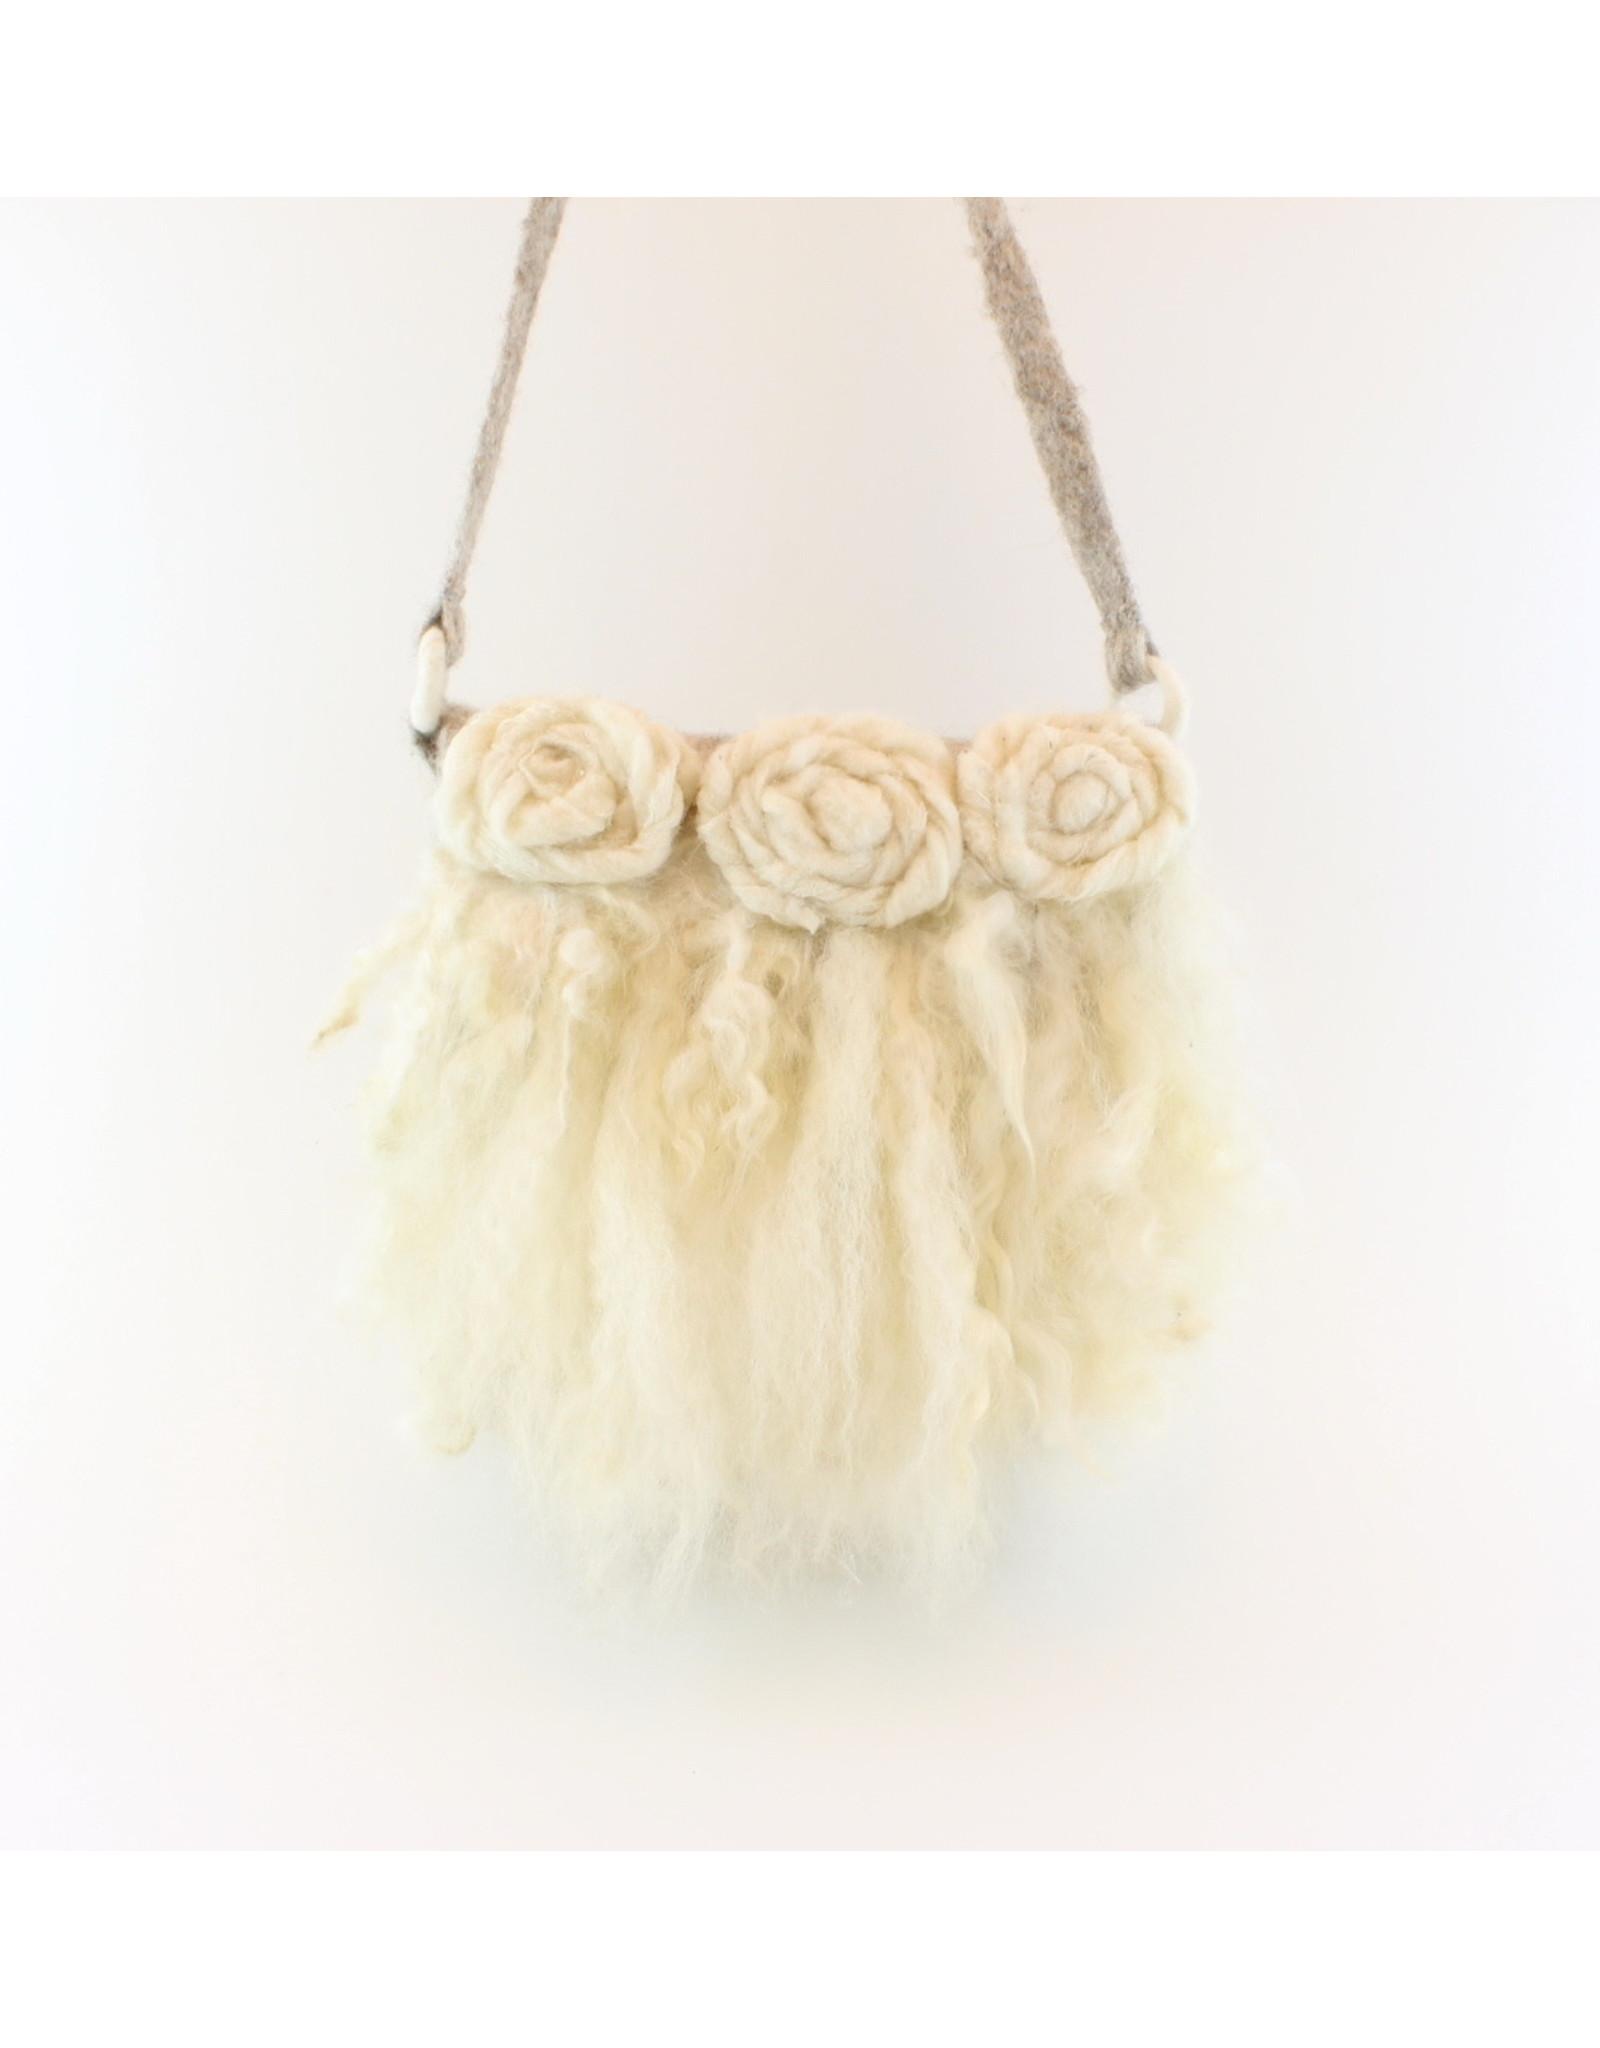 Larysa Grygoryan Small Handbag by Larysa Grygoryan